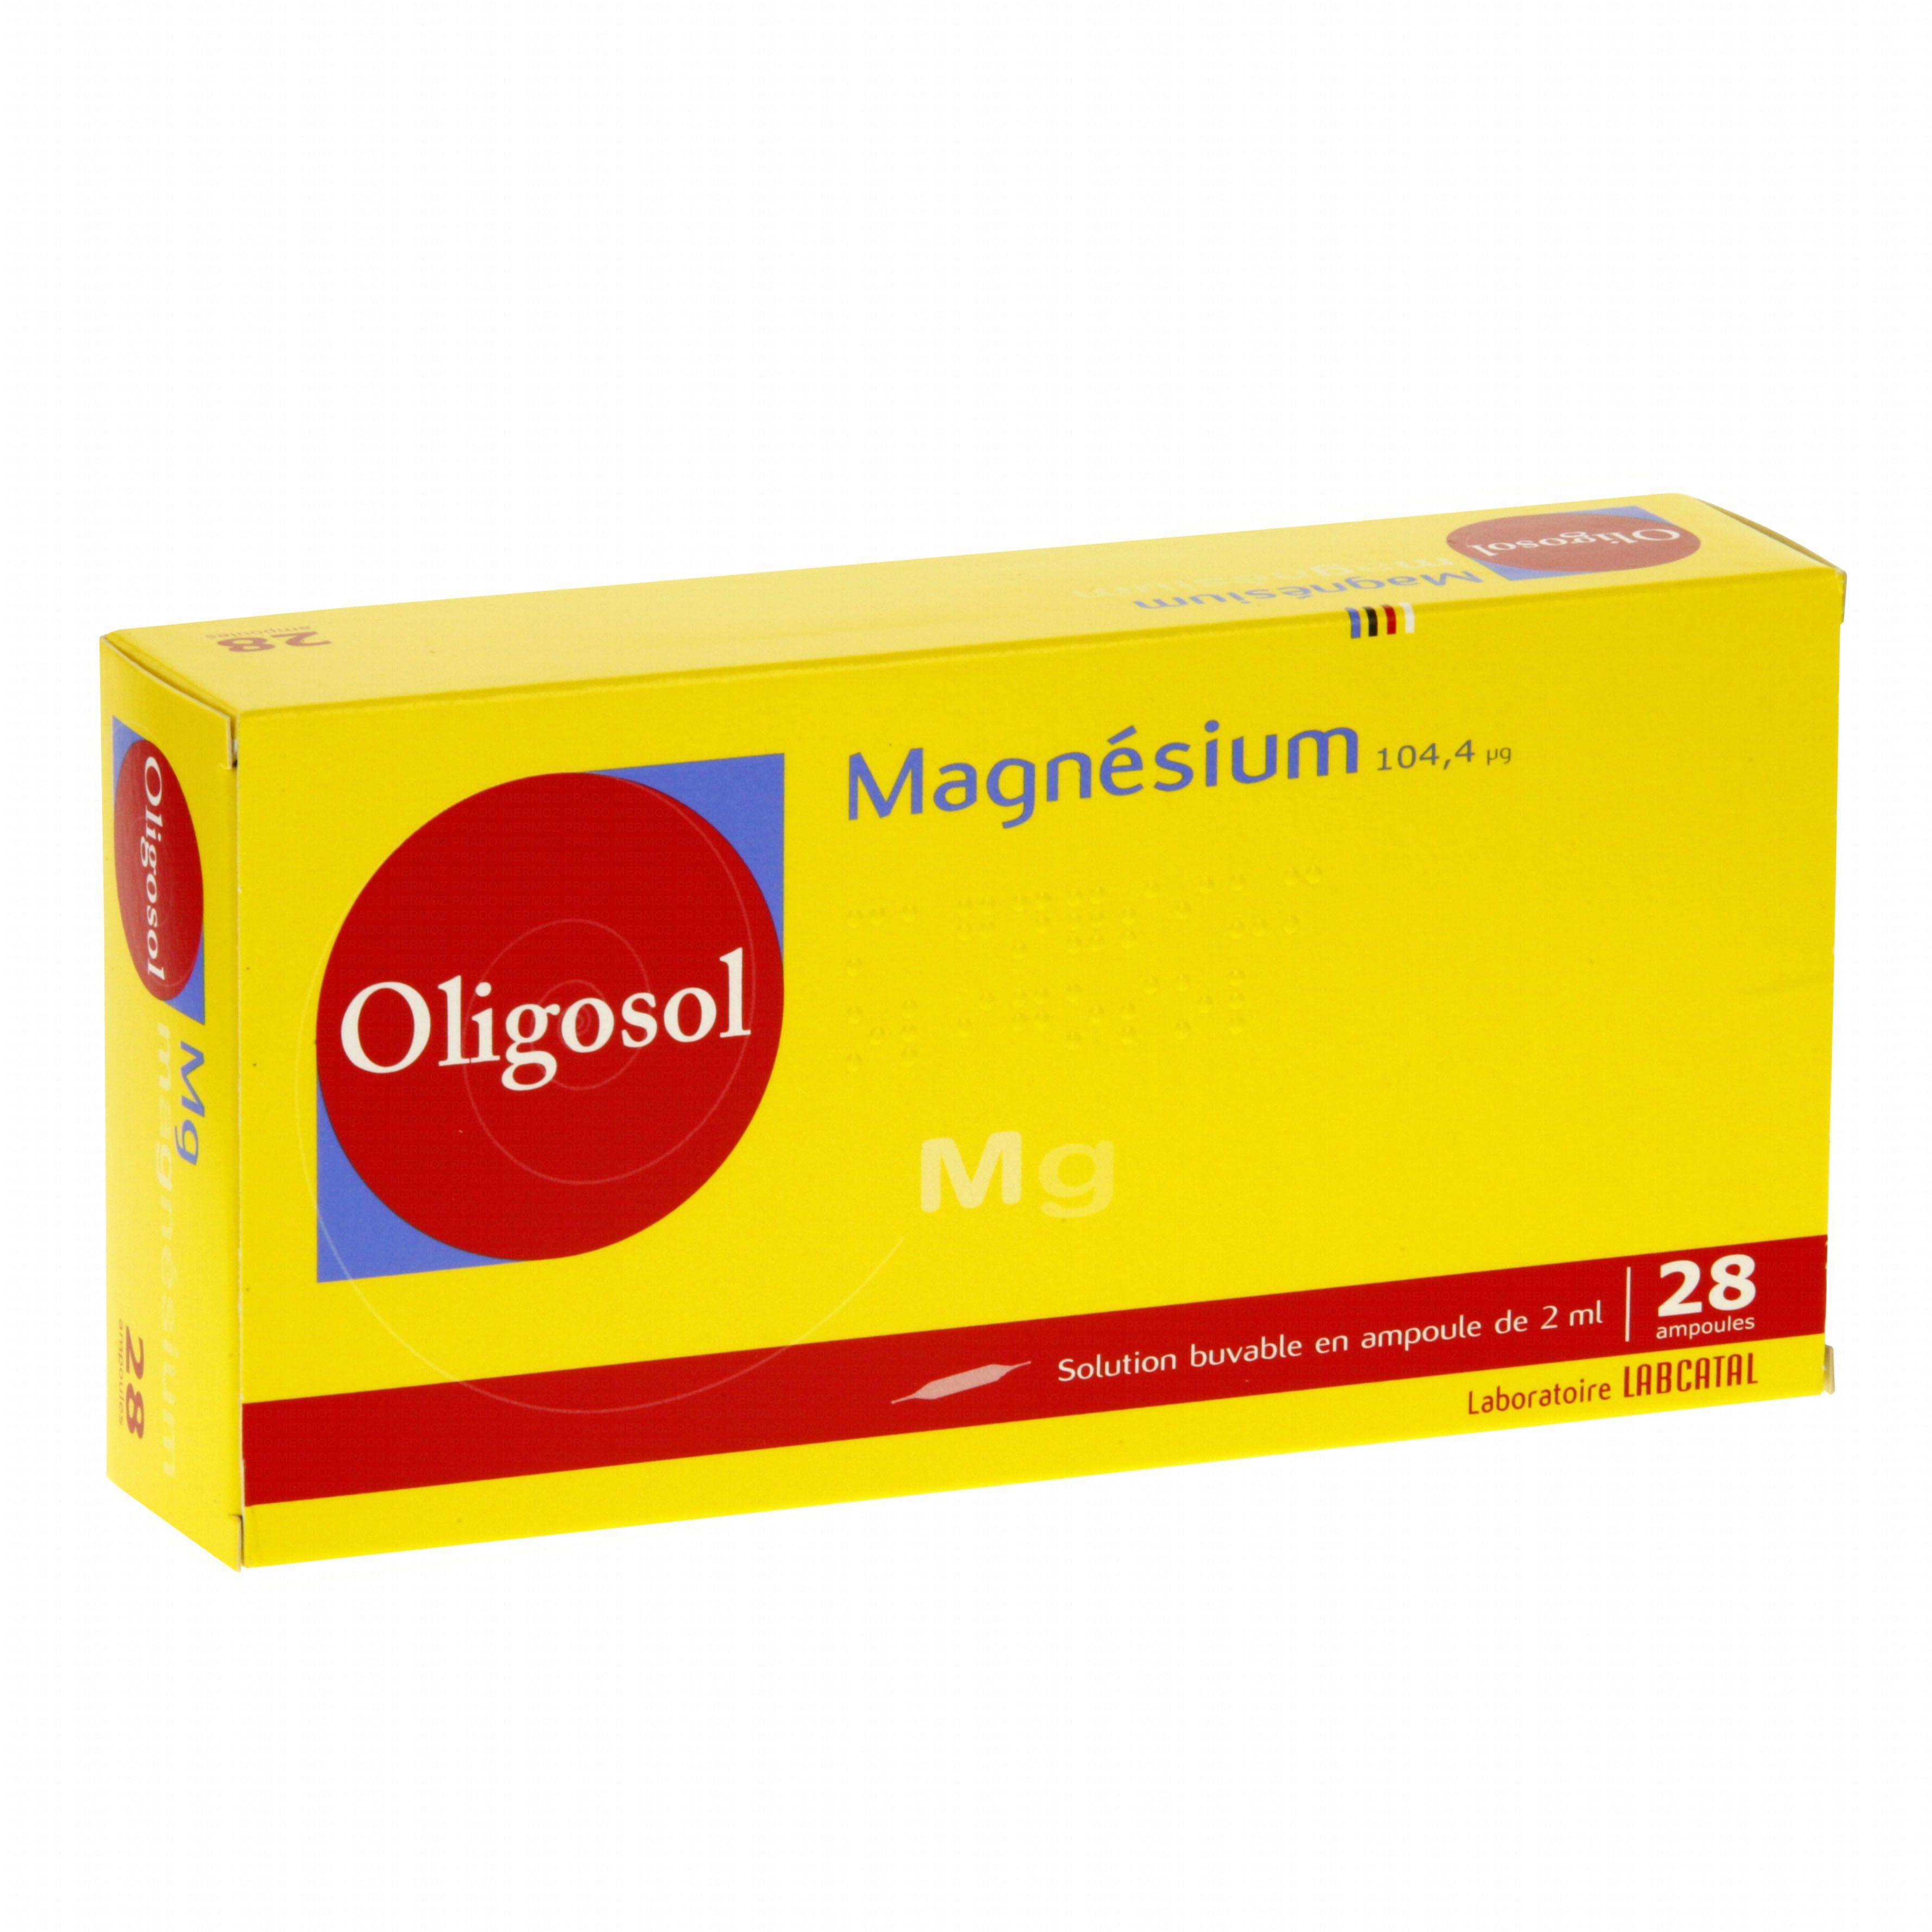 ampoule oligosol